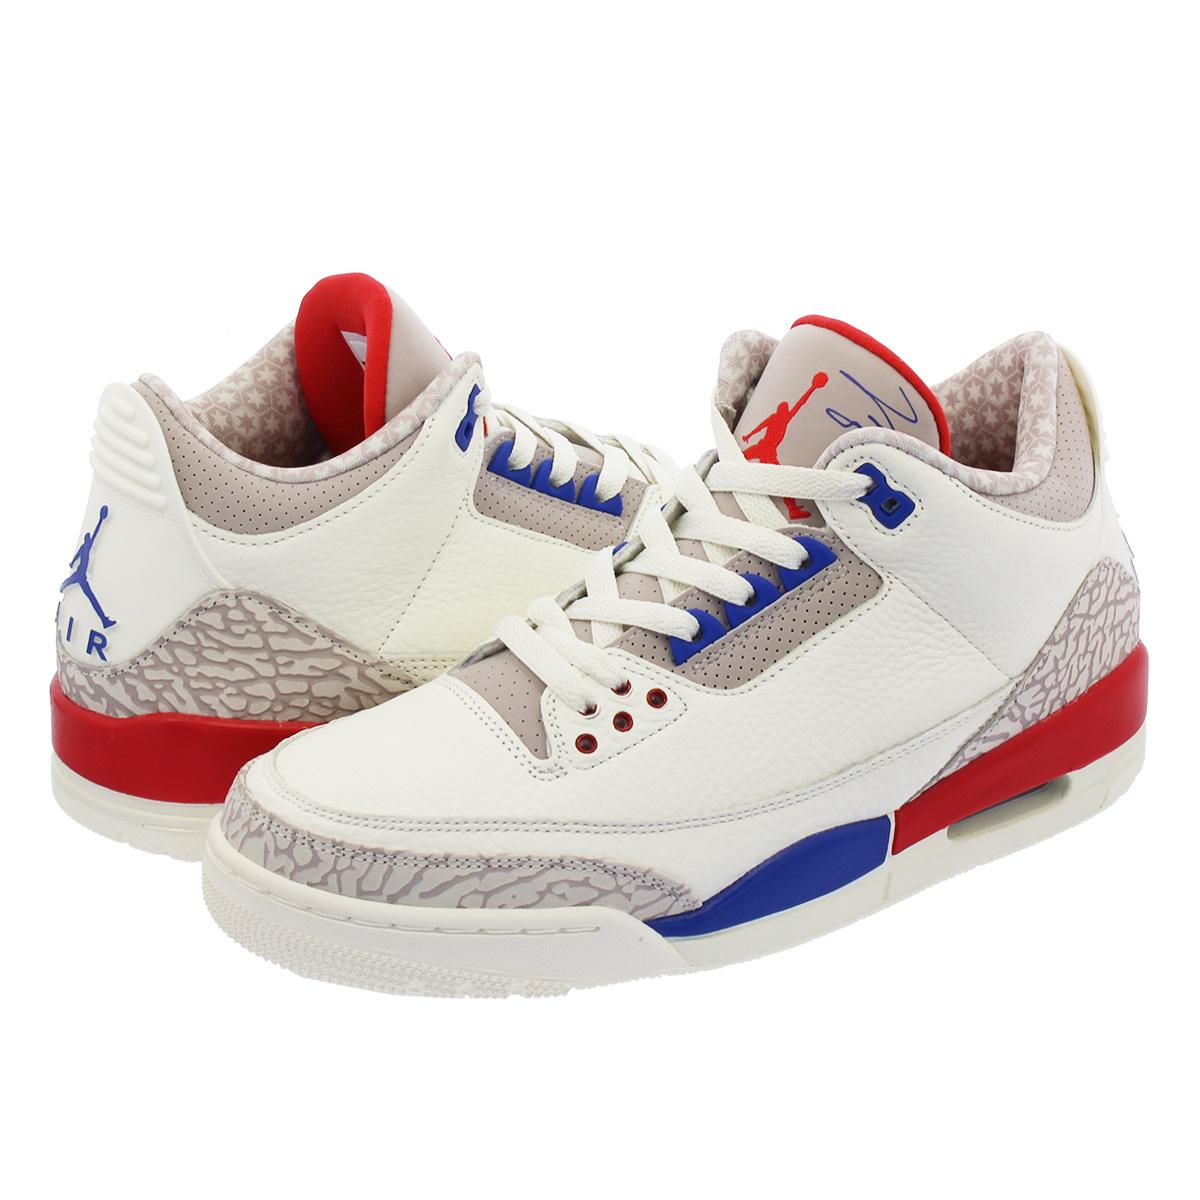 36c5efb3011 NIKE AIR JORDAN 3 RETRO Nike Air Jordan 3 nostalgic SAIL/SPORT ROYAL/FIRE  RED 136,064-140